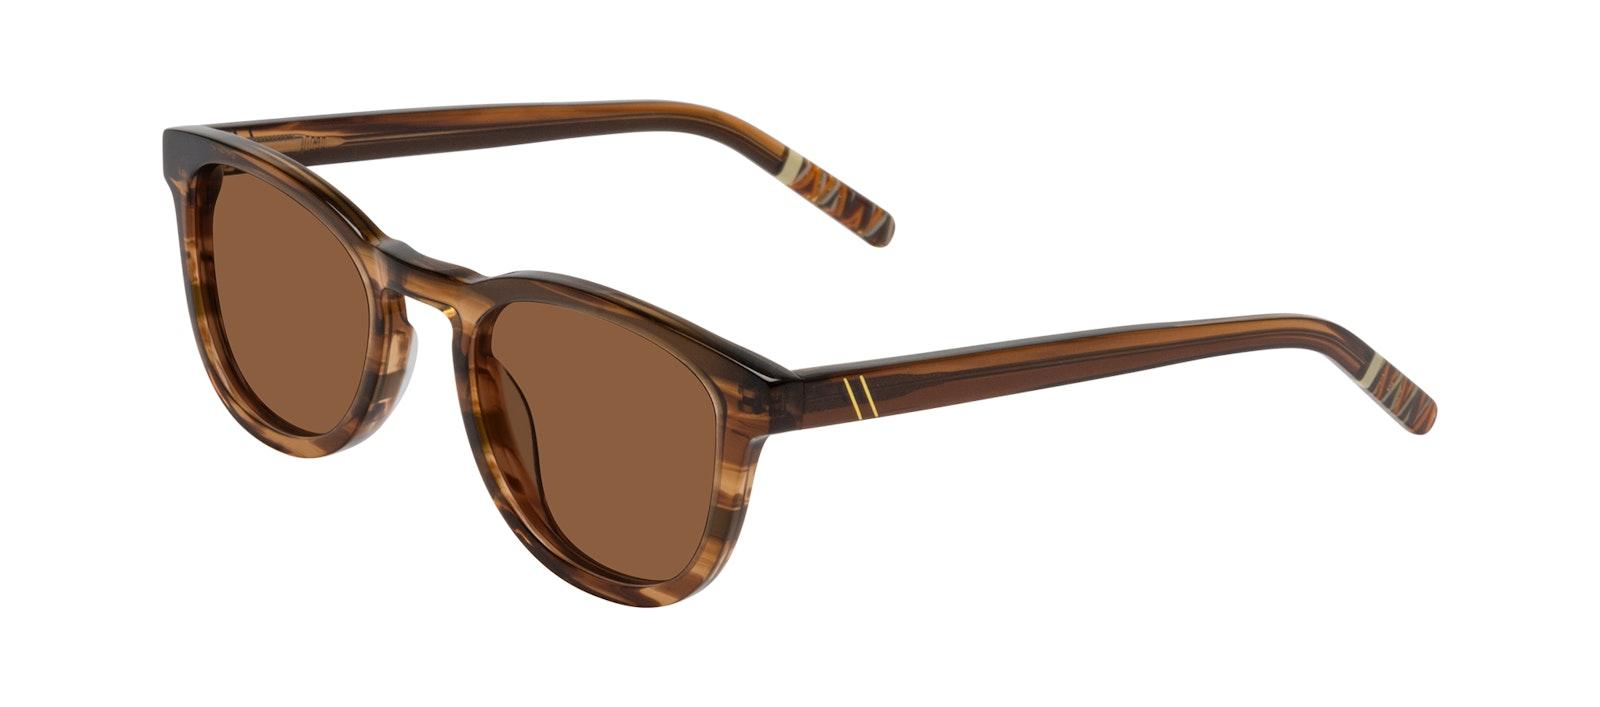 Affordable Fashion Glasses Round Sunglasses Men Goal Smokey Havana Tilt